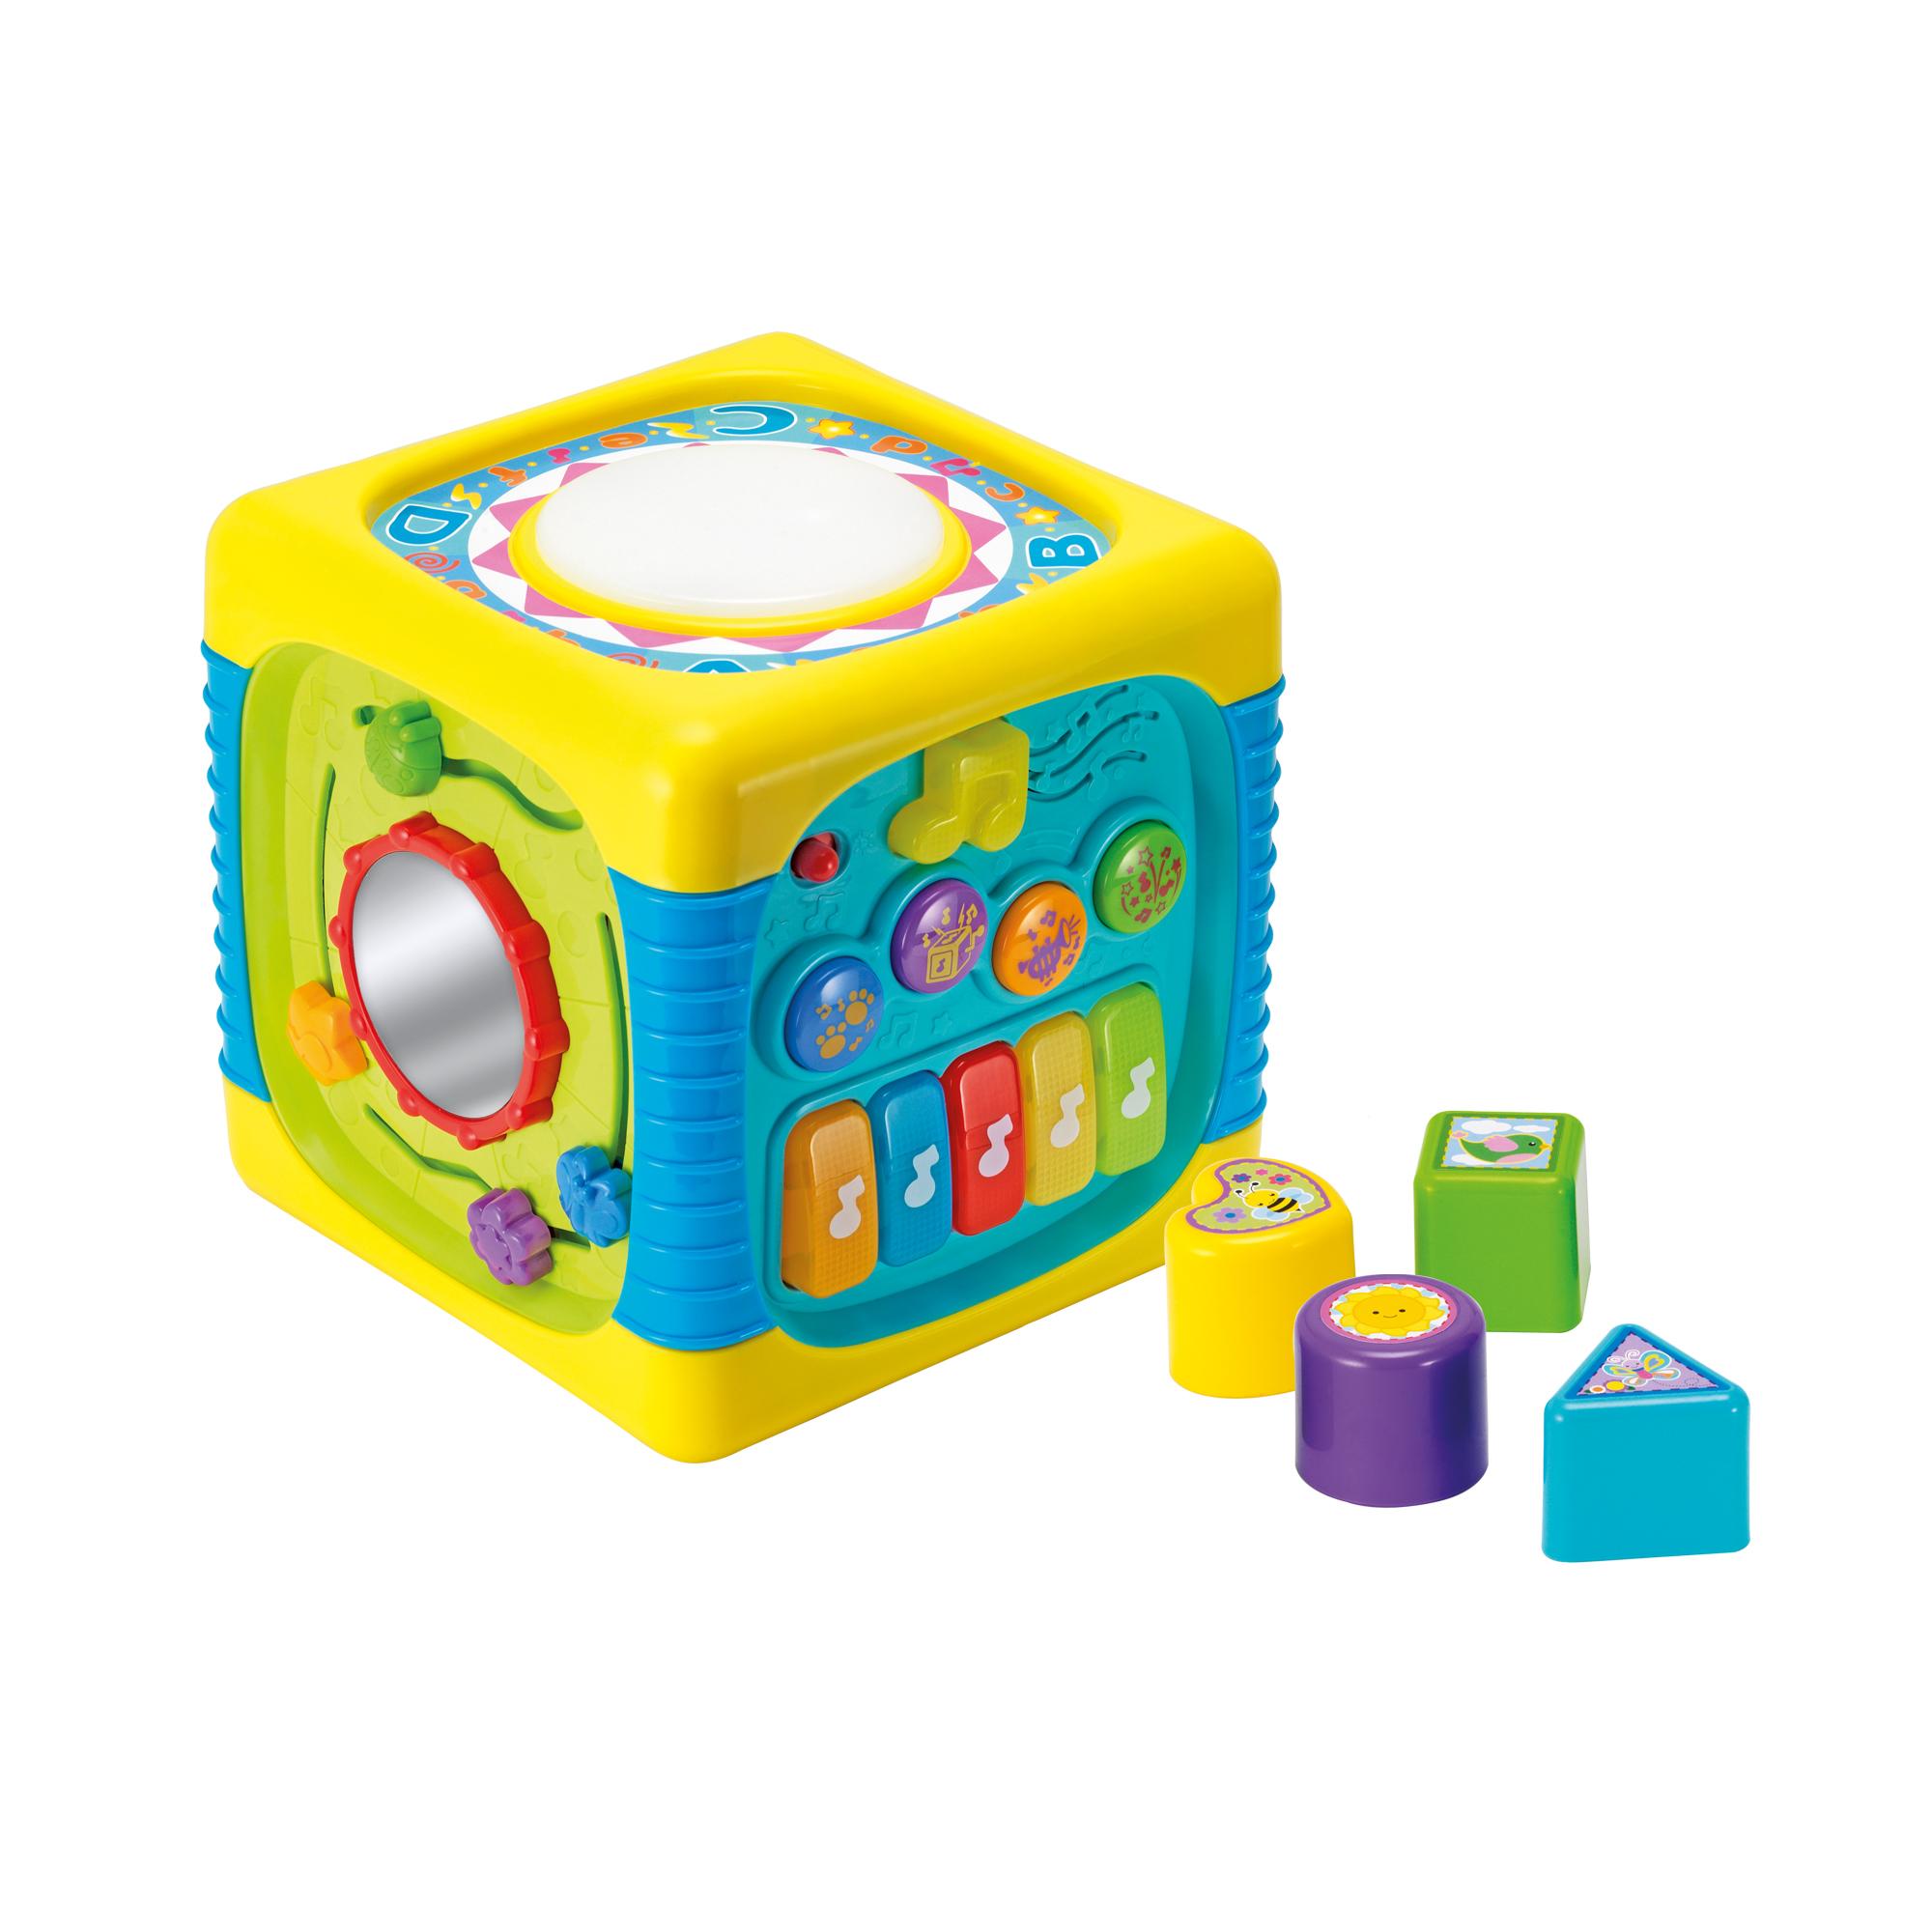 Just Kidz Music Fun Activity Cube